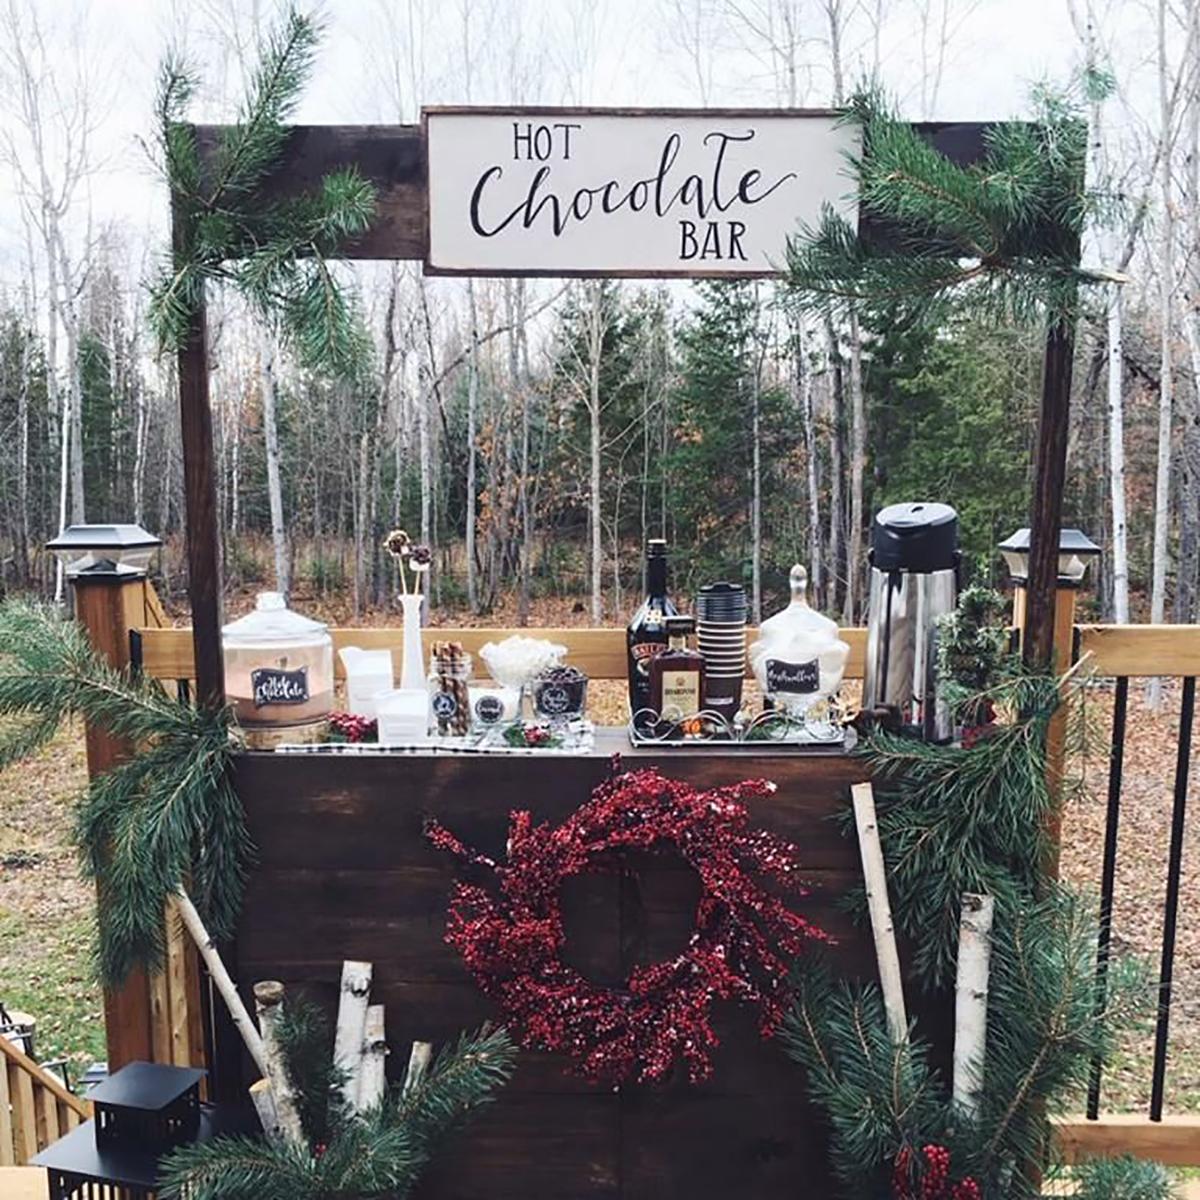 20 Winter Wedding Ideas That Will Melt Your Heart